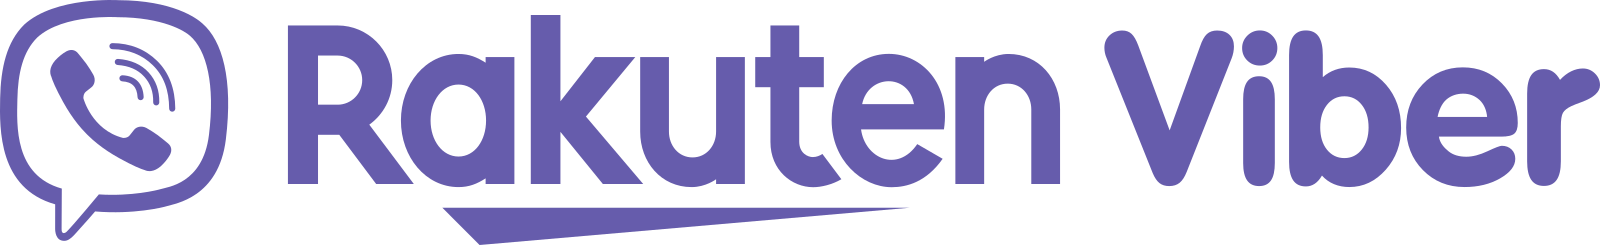 viber logo icon 7 - Rakuten Viber Logo - Icon